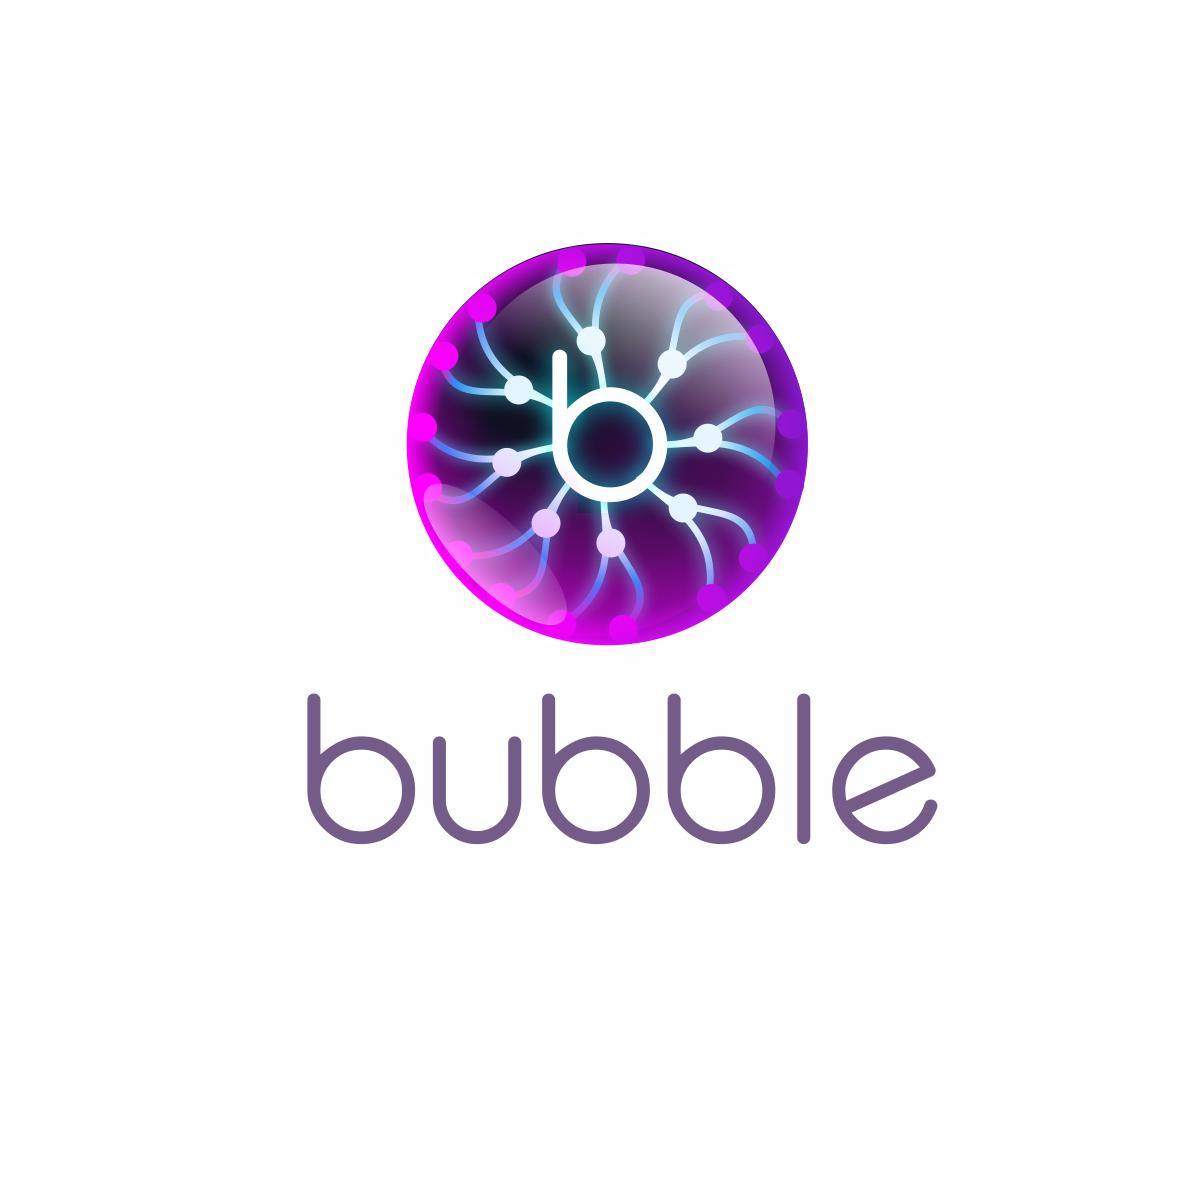 Logo futurezco de una burbuja para una plataforma digital